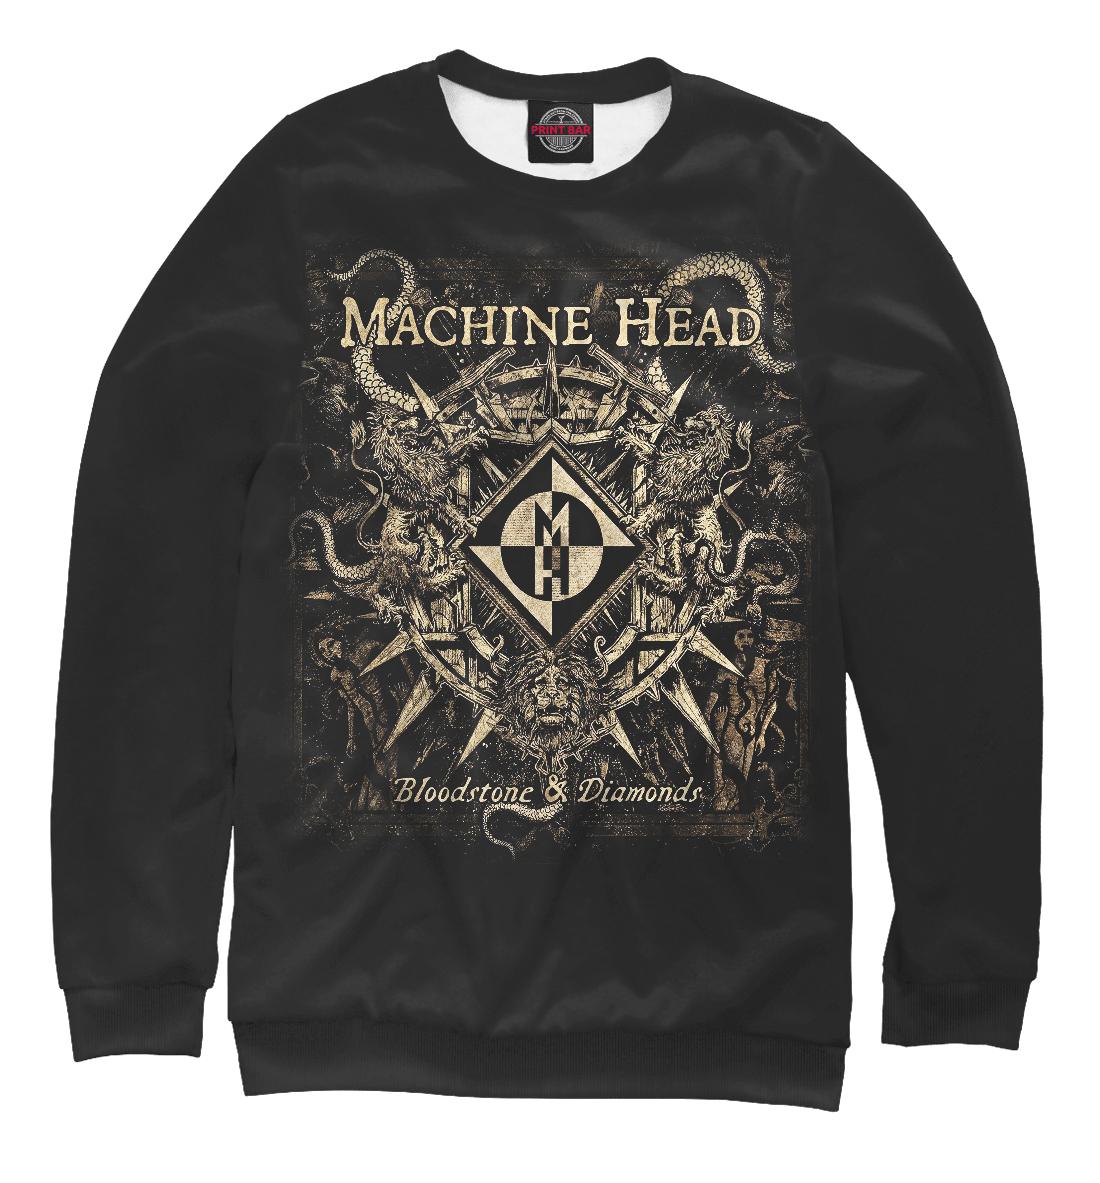 Купить Machine Head, Printbar, Свитшоты, MZK-477891-swi-1